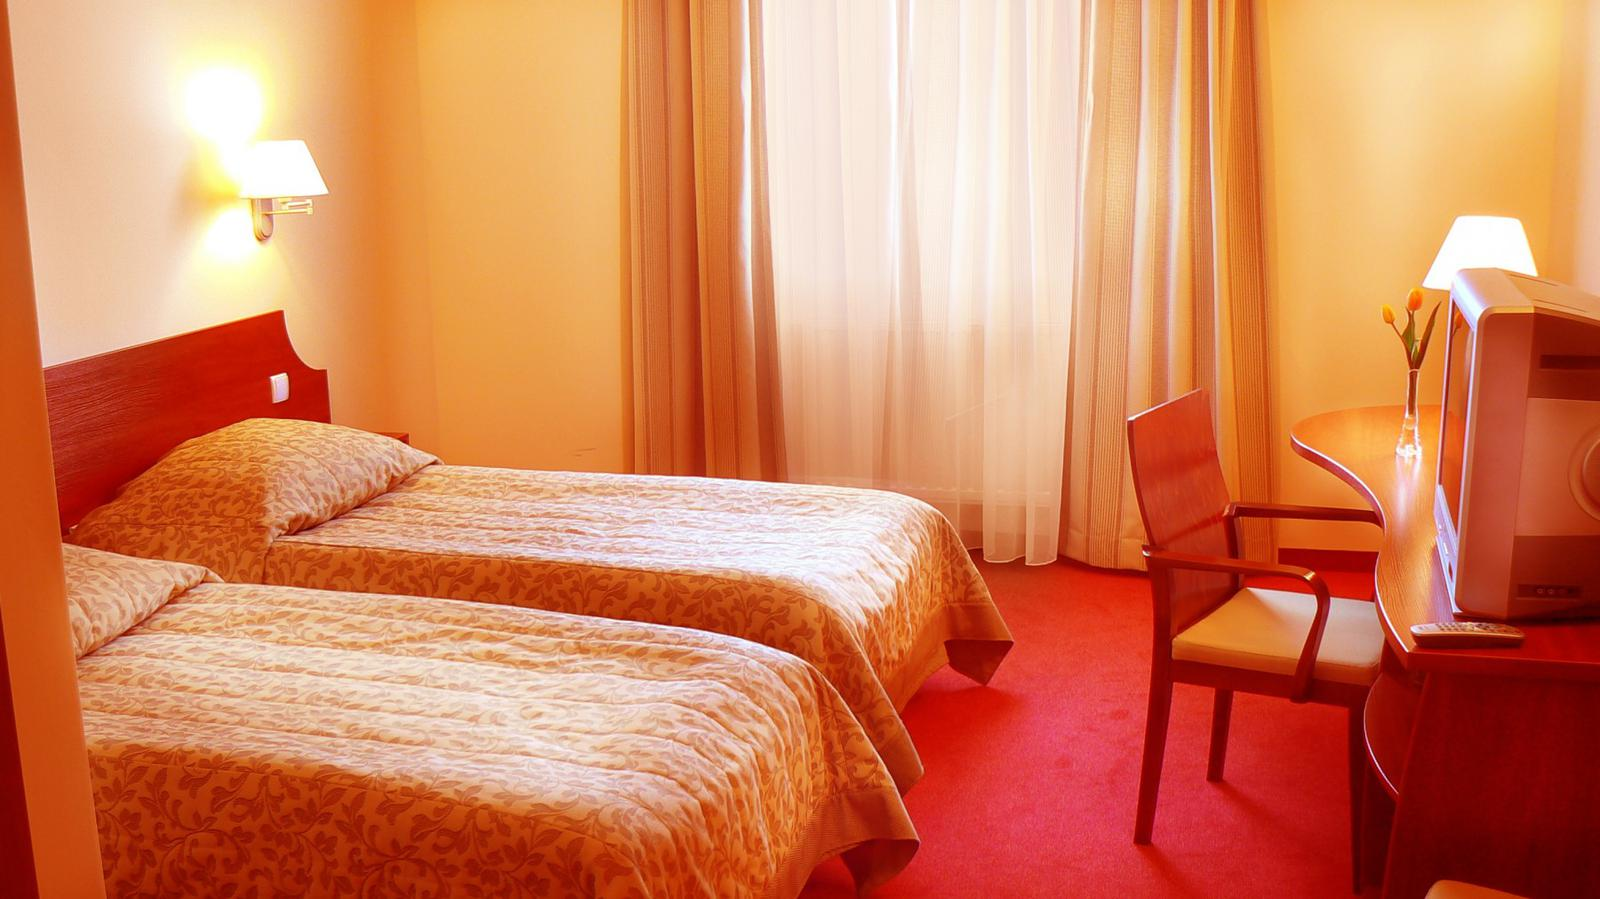 Zimmer im Hotel Major